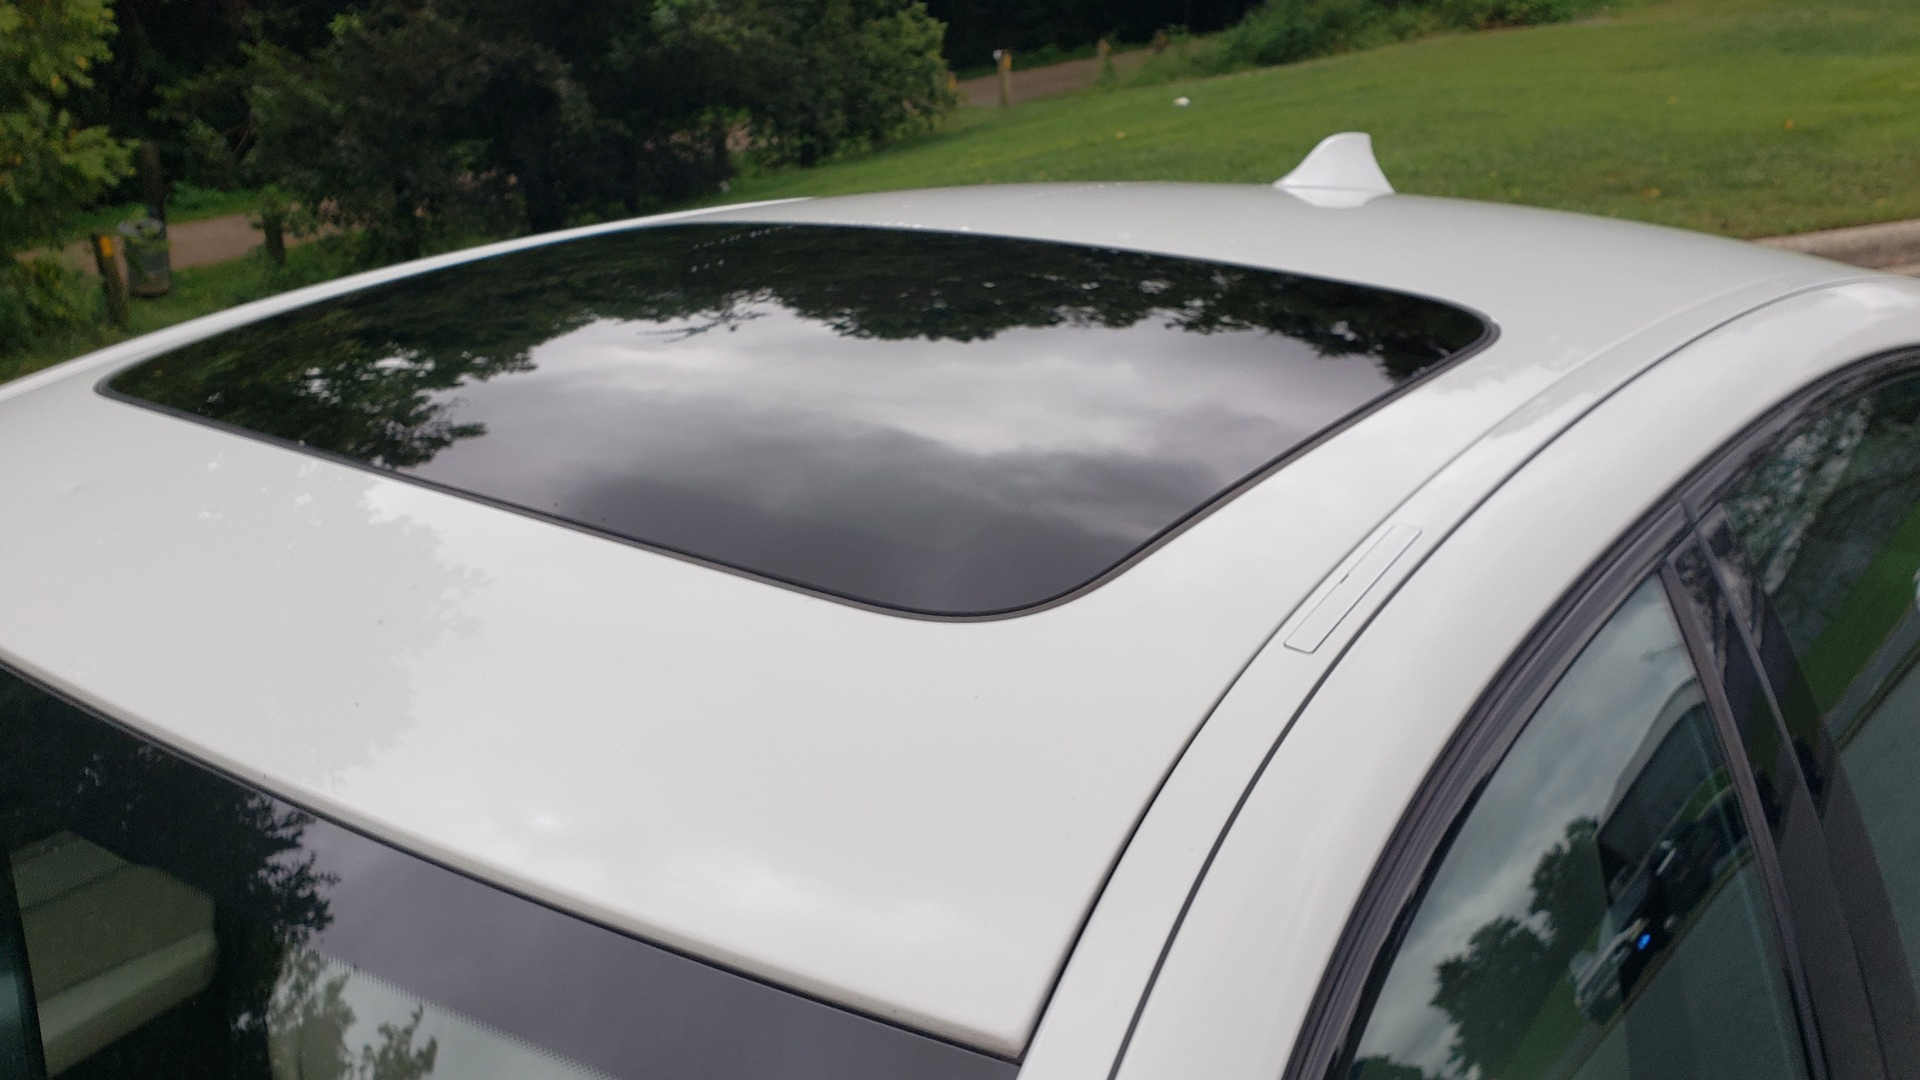 Used 2012 BMW 5 SERIES 550I M SPORT / NAV / CONV PKG / SUNROOF / PREM SND / REARVIEW for sale Sold at Formula Imports in Charlotte NC 28227 8